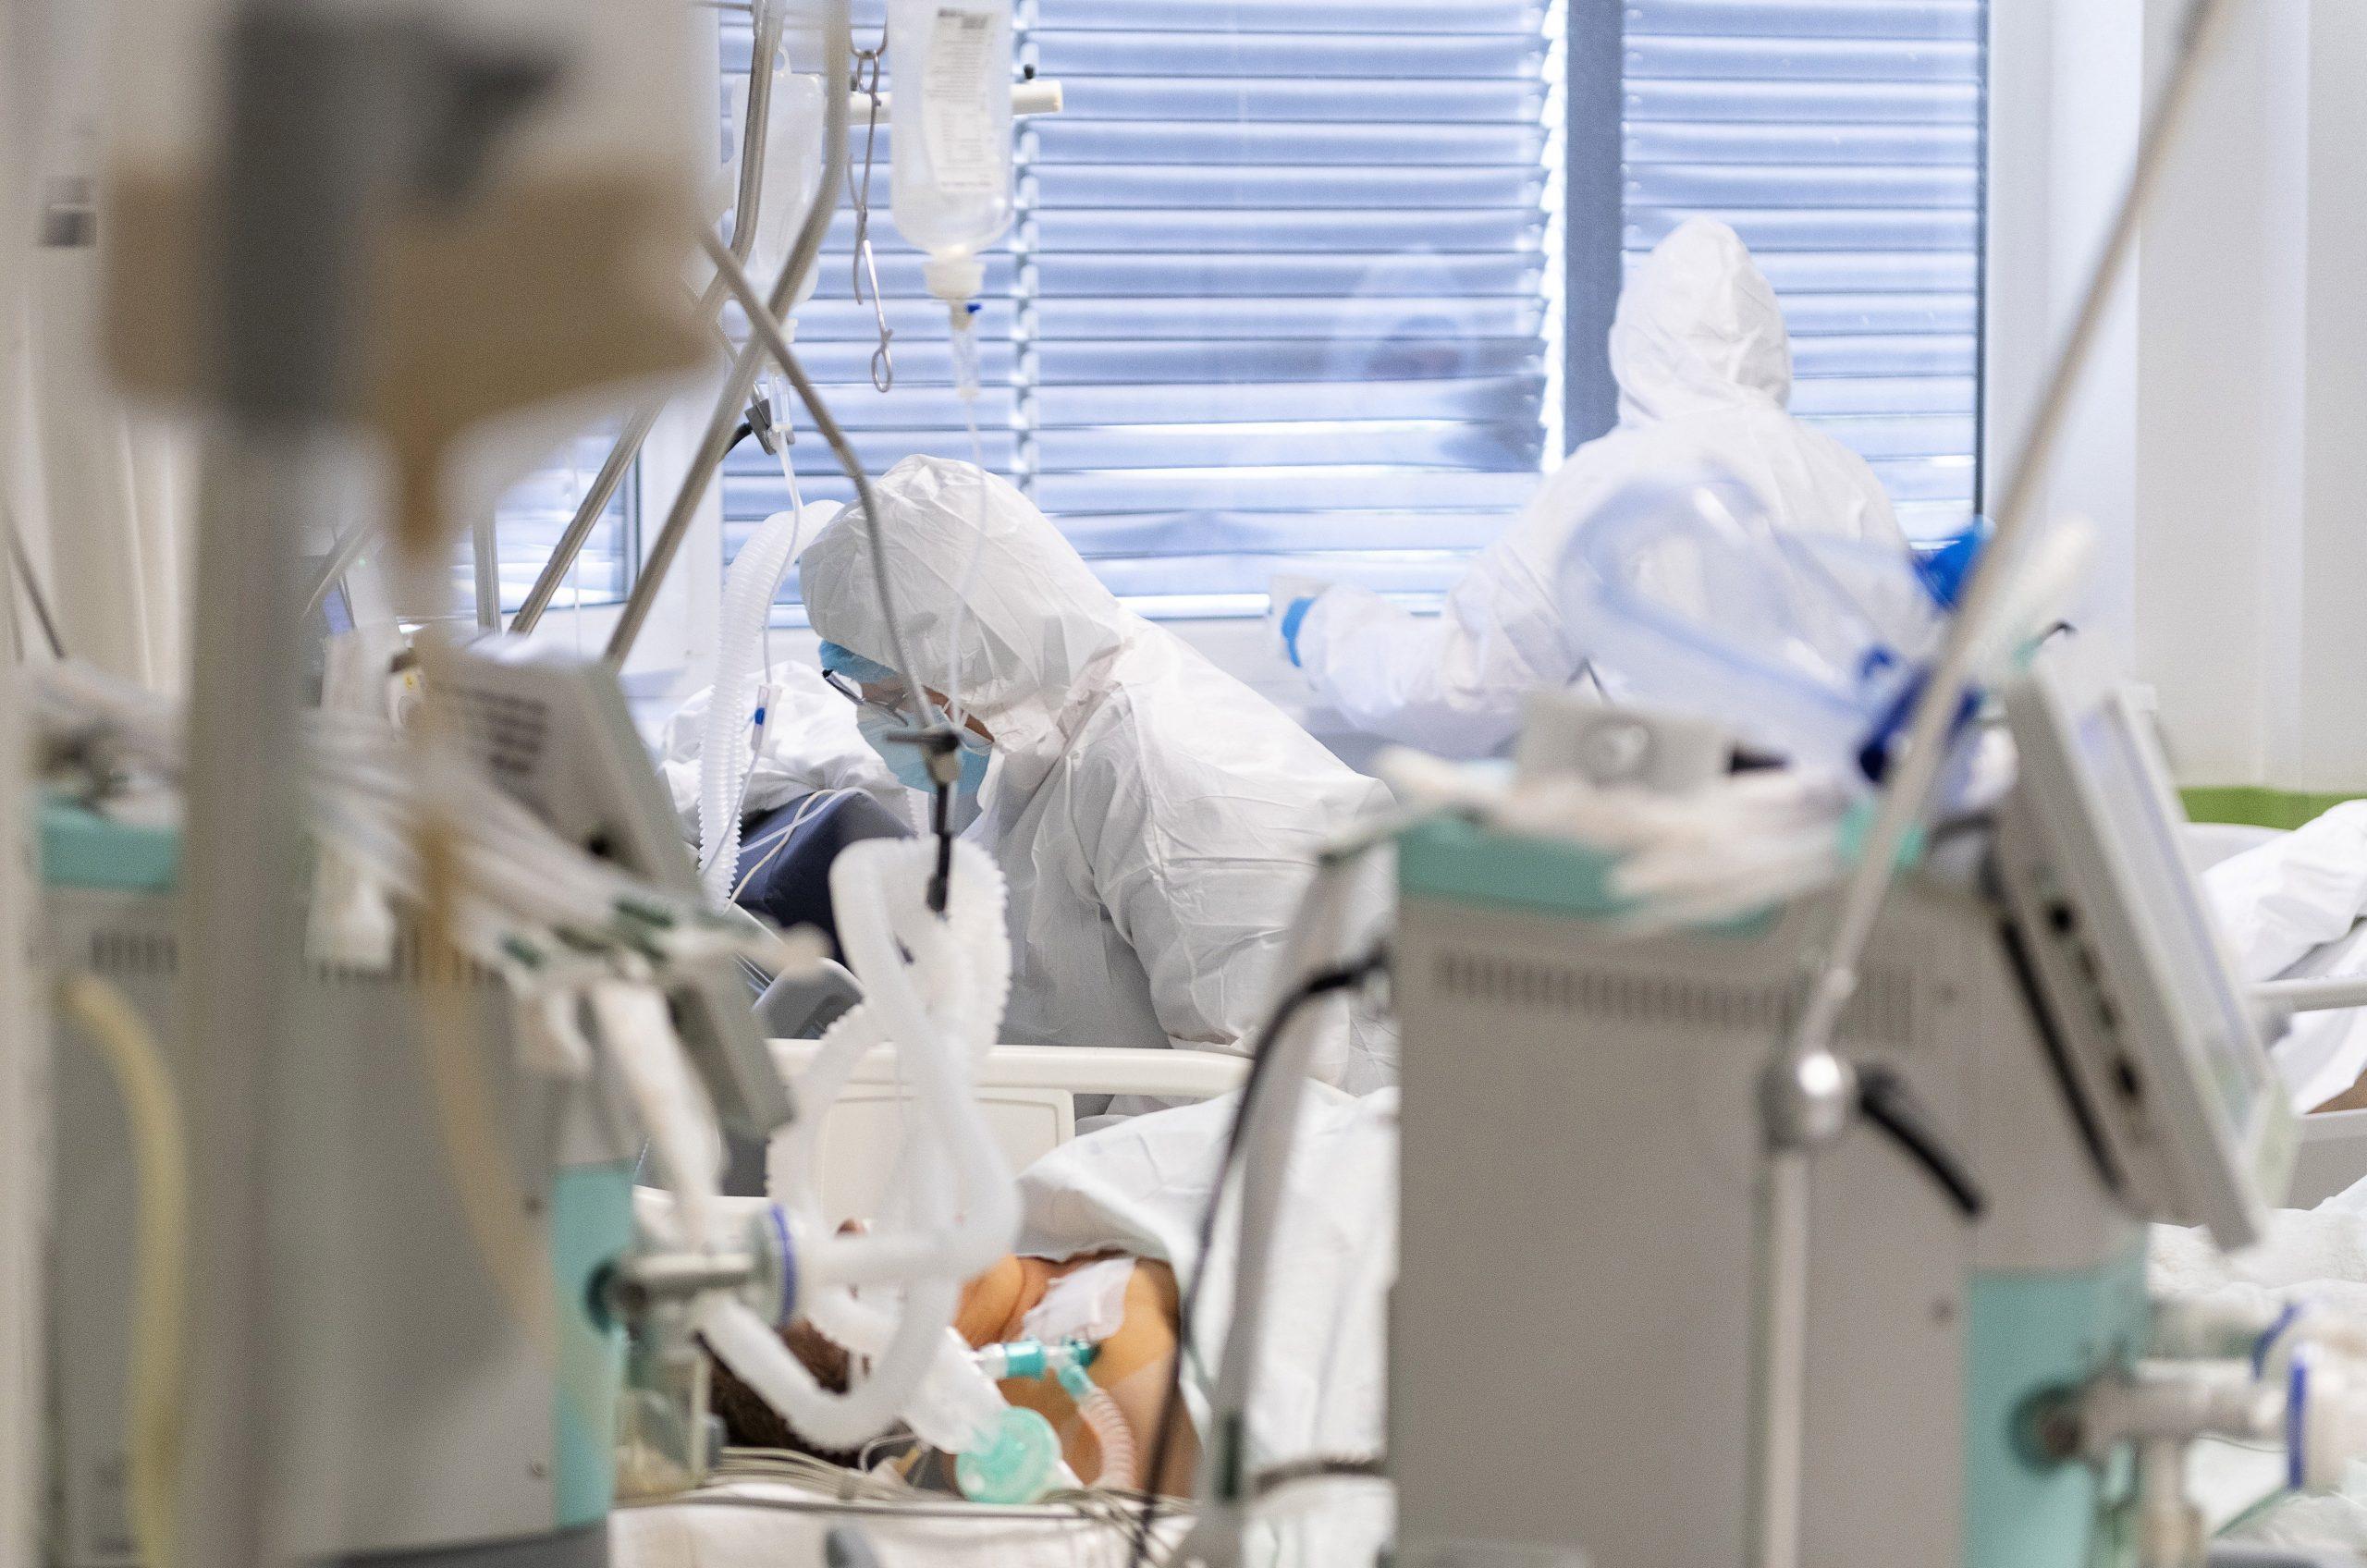 Hospital Director Confirms Harrowing Reality of Hungary's Hospitals